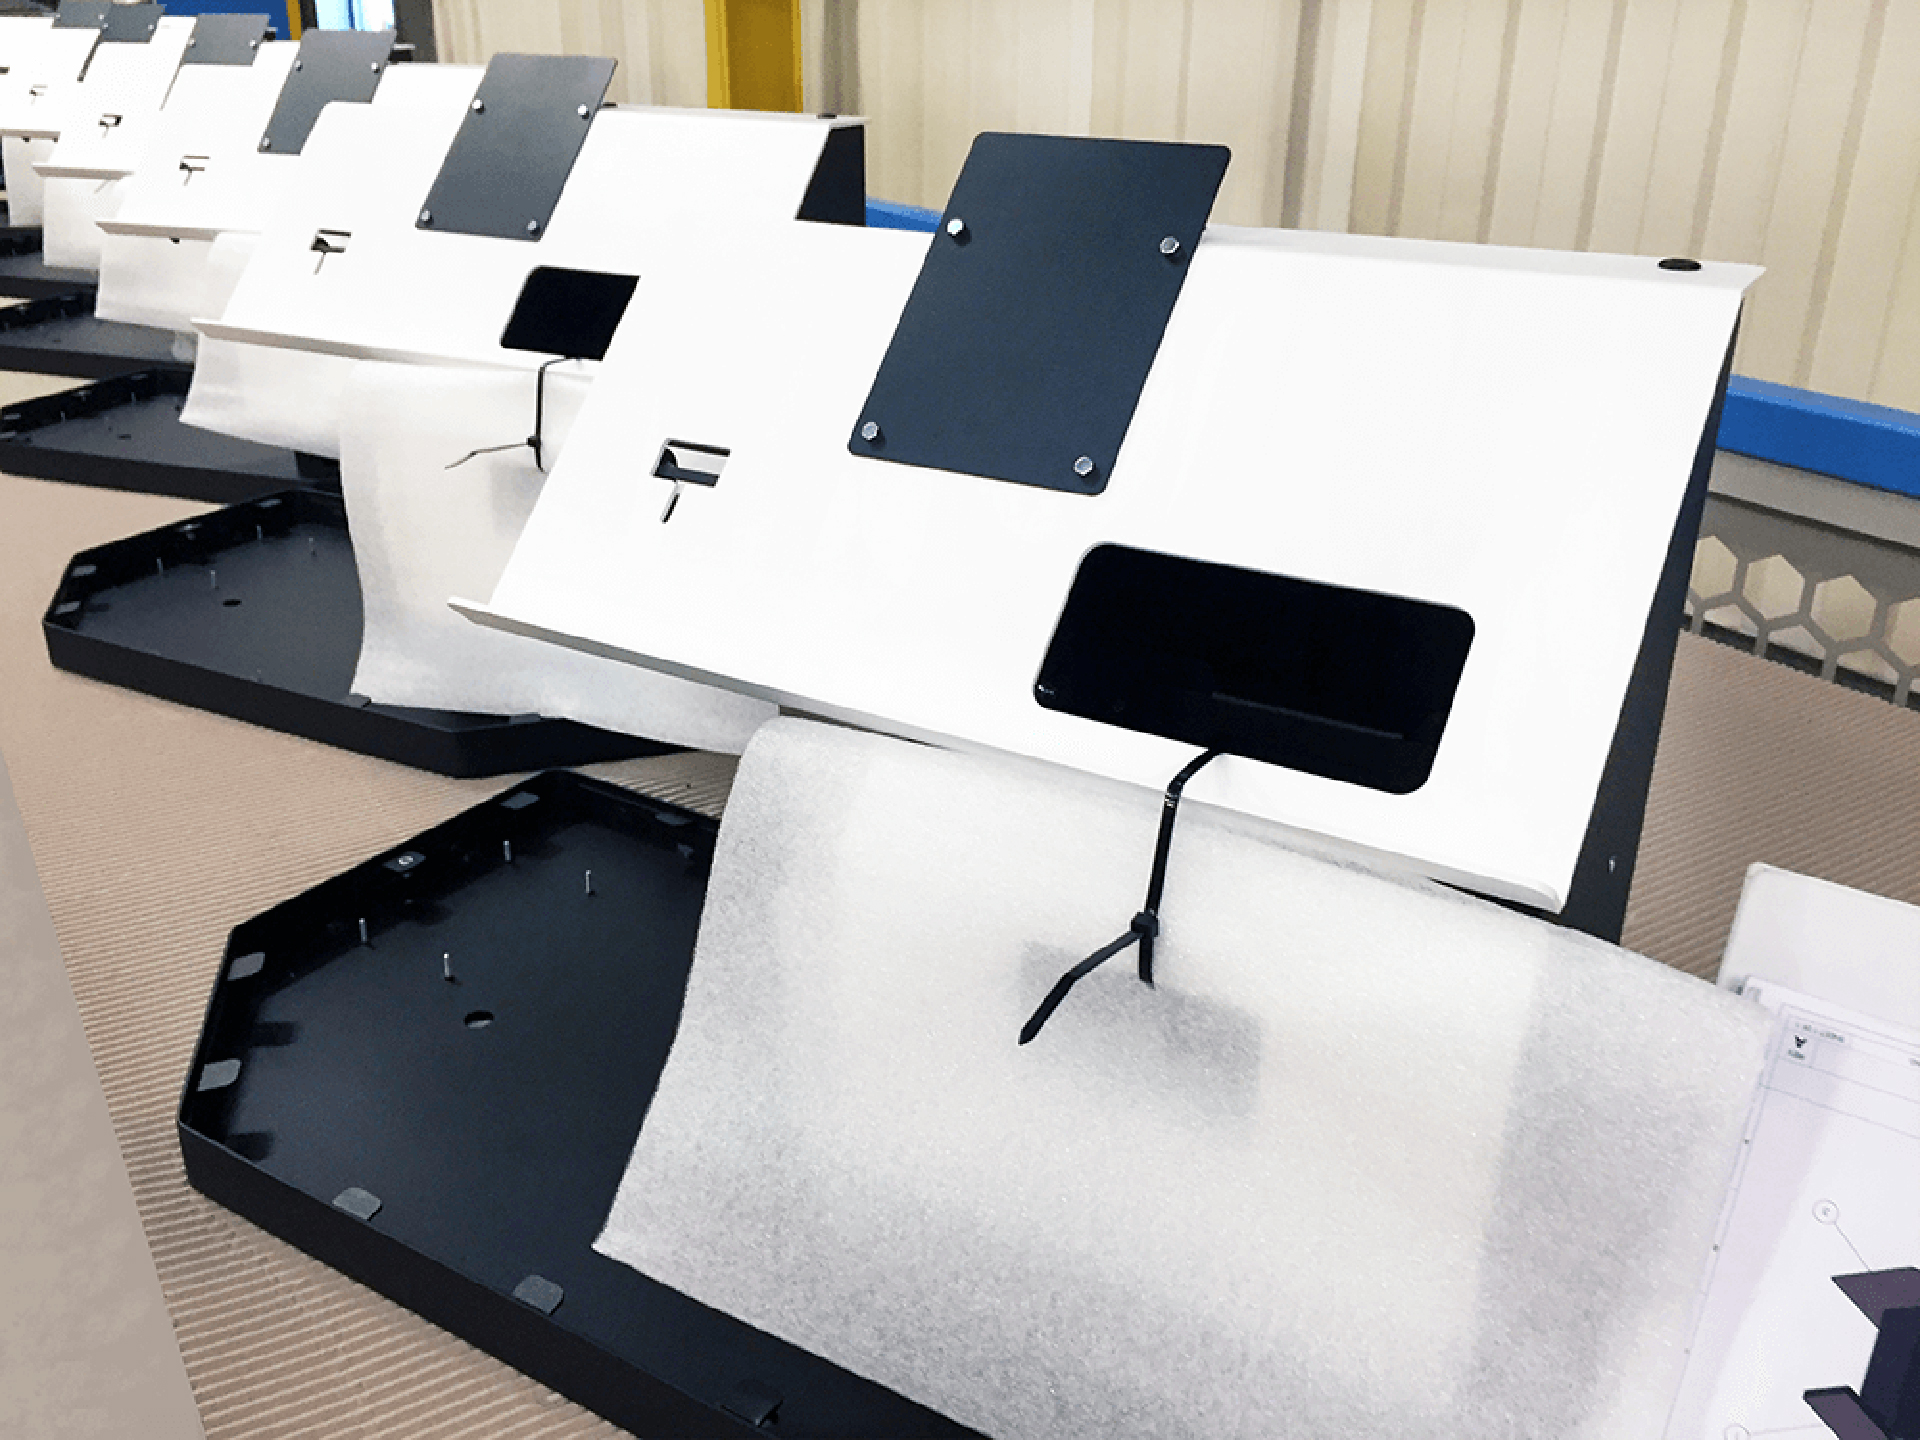 White powder coated interactive kiosks